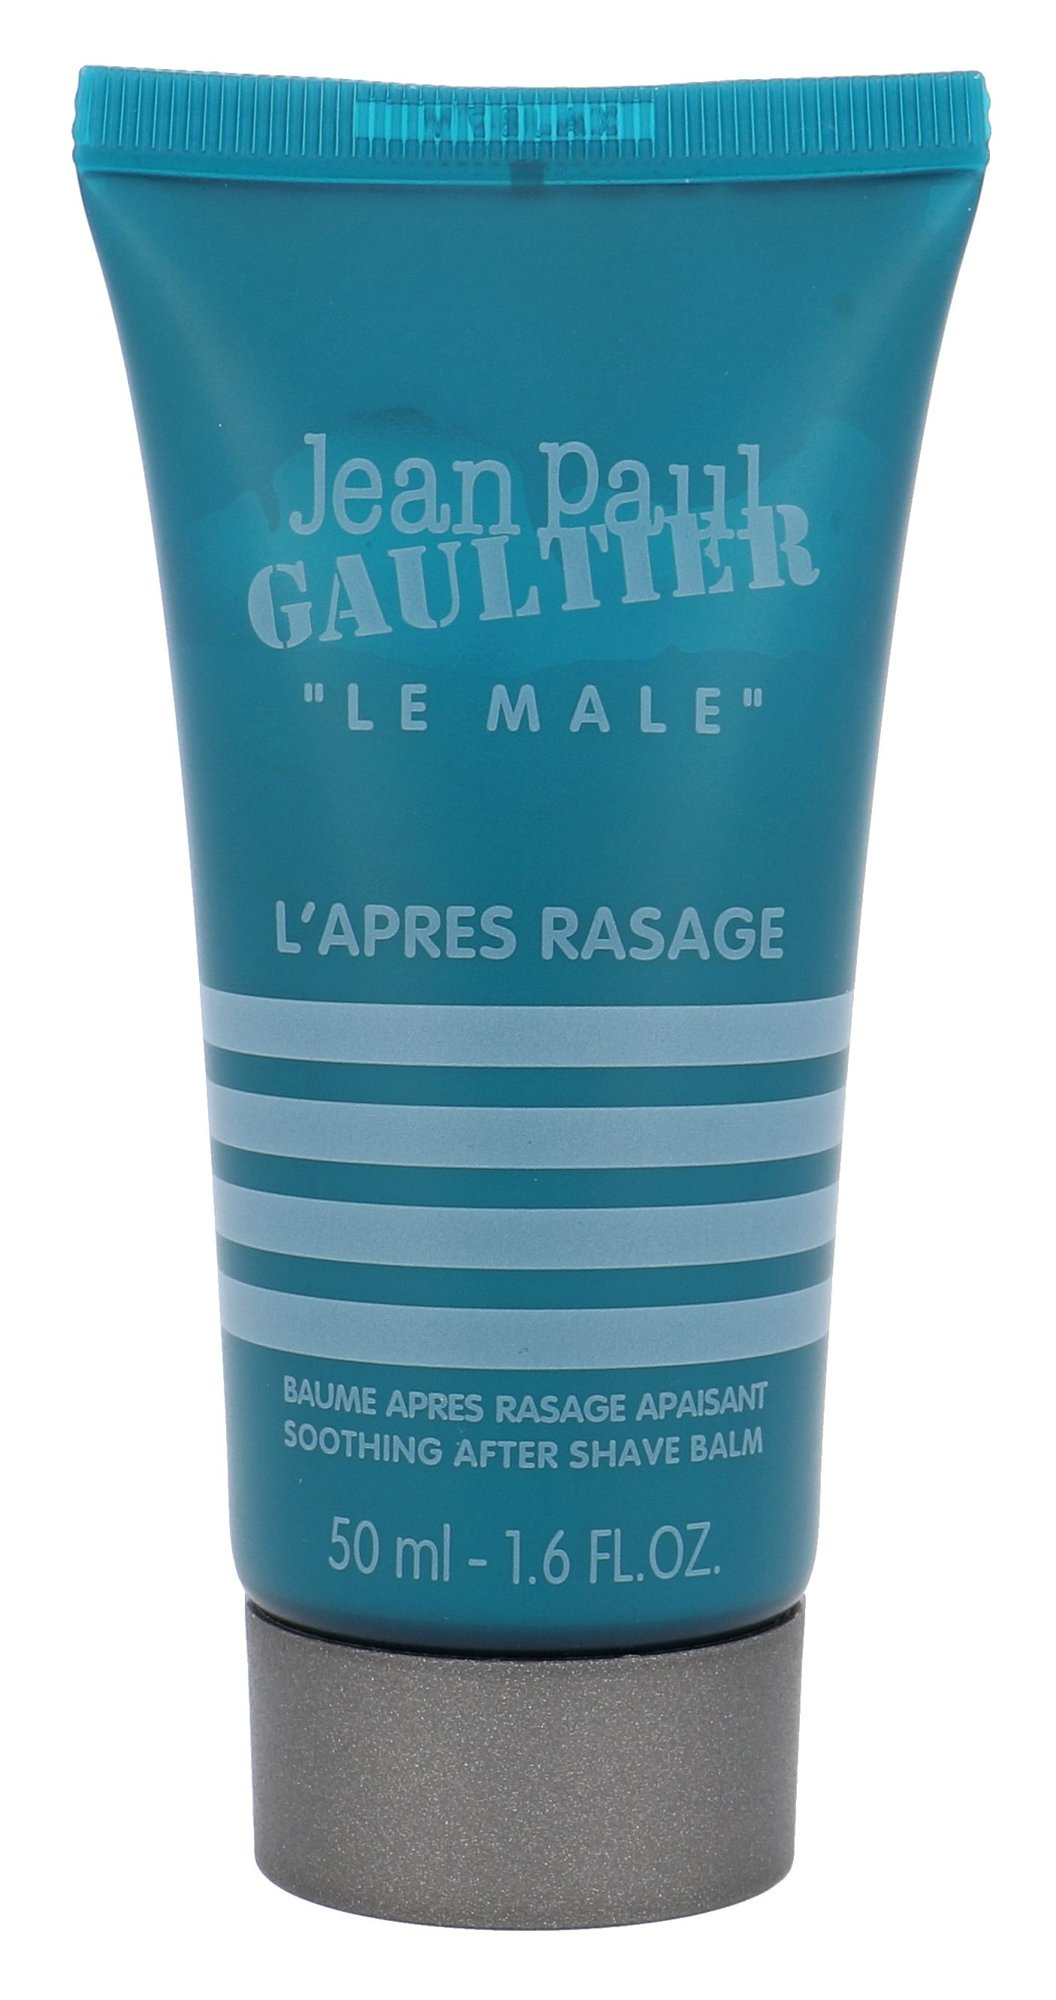 Jean Paul Gaultier Le Male After shave balm 50ml